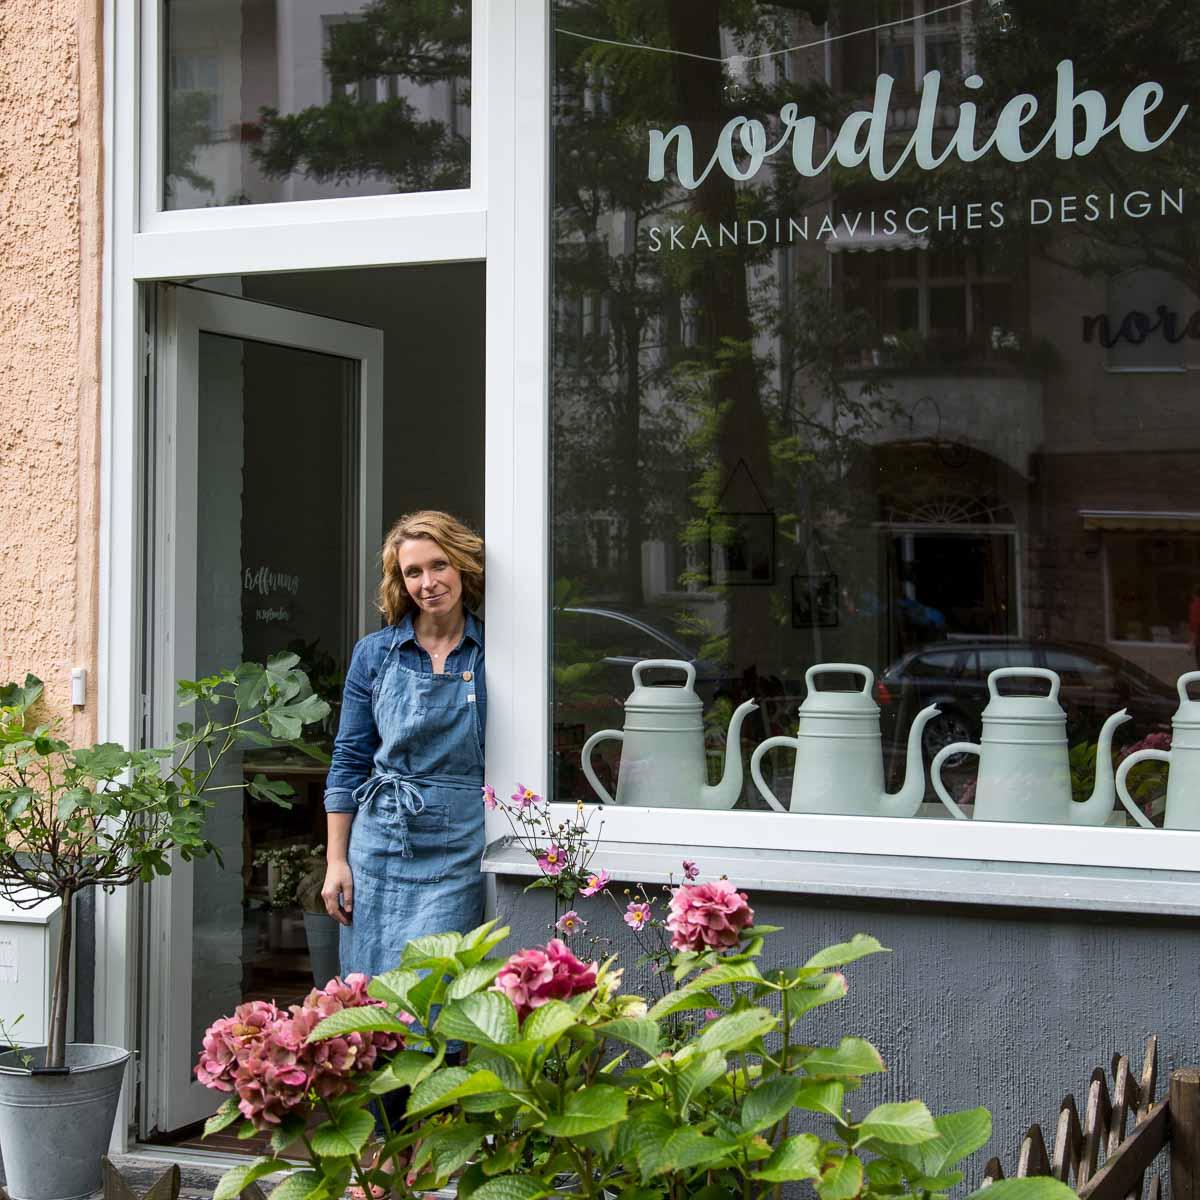 skandinavisches design bei nordliebe in sch neberg berlin creme guides. Black Bedroom Furniture Sets. Home Design Ideas